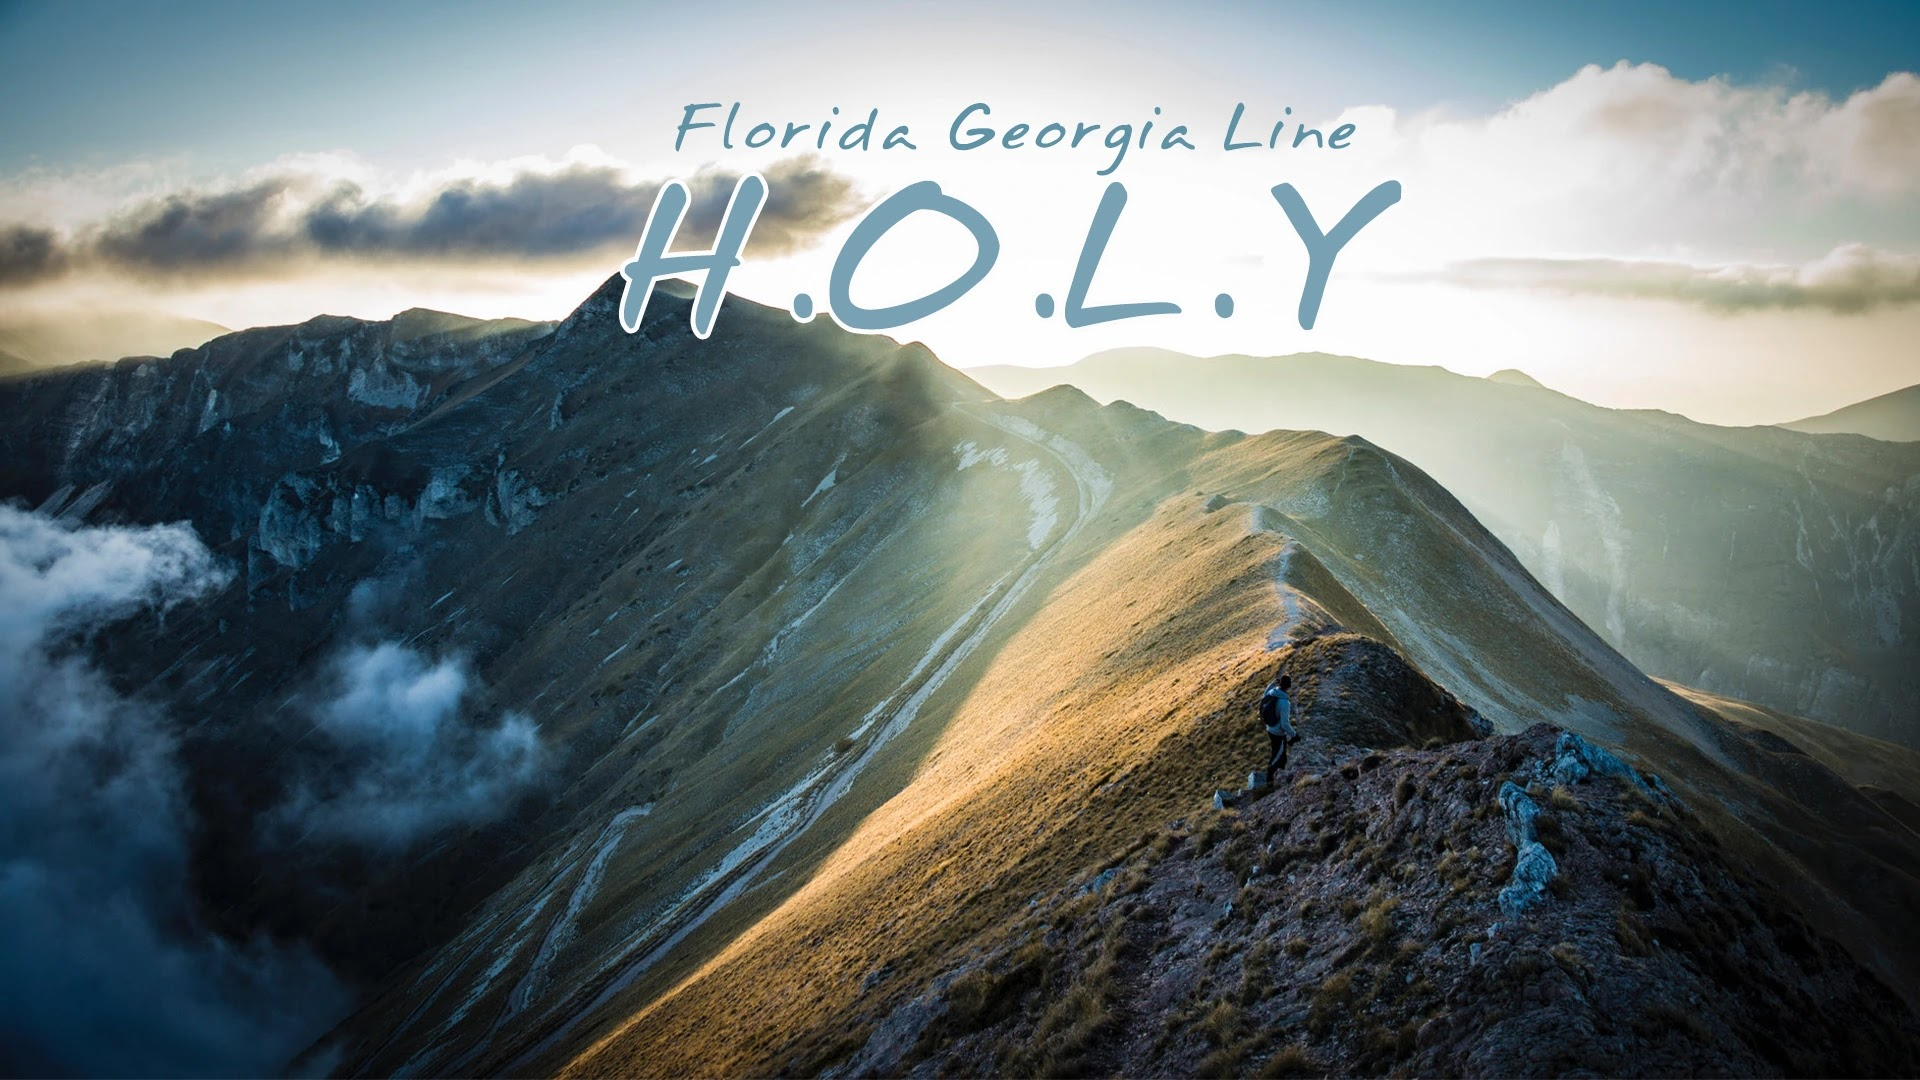 H.O.L.Y - Florida Georgia Line